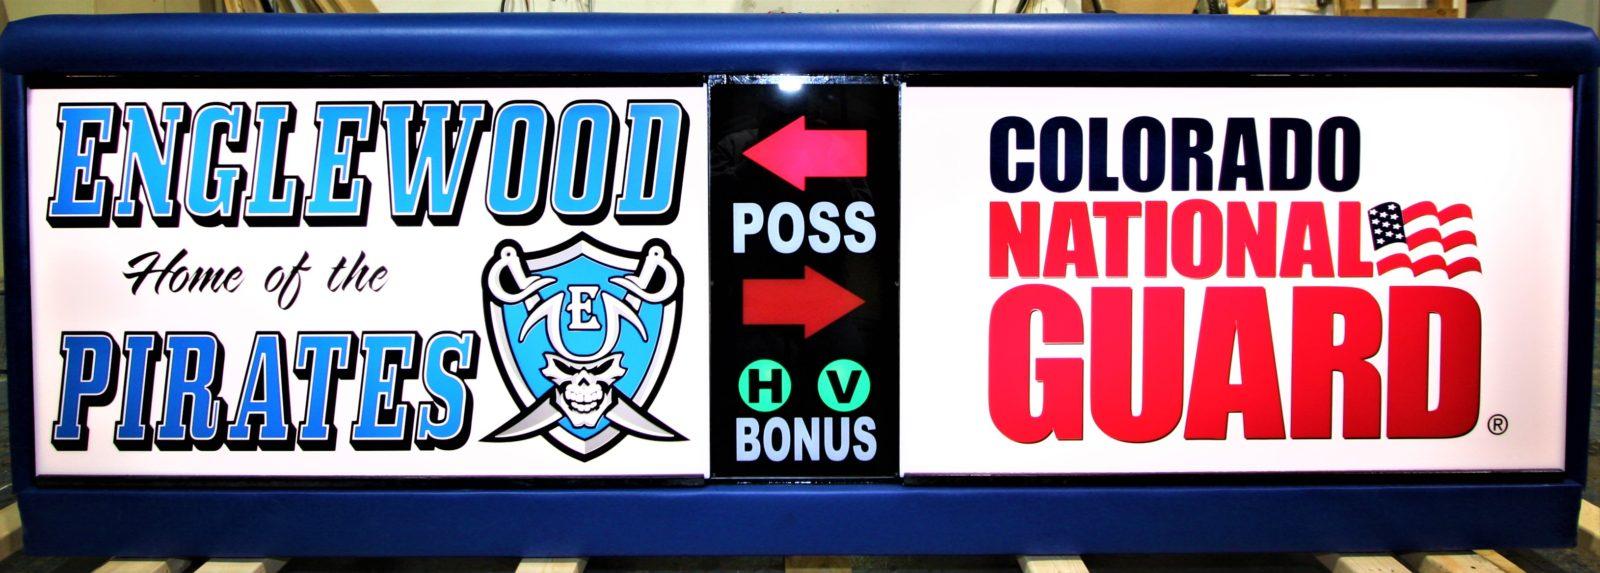 Engelwood High School scoring table Colorado Army National Guard COARNG